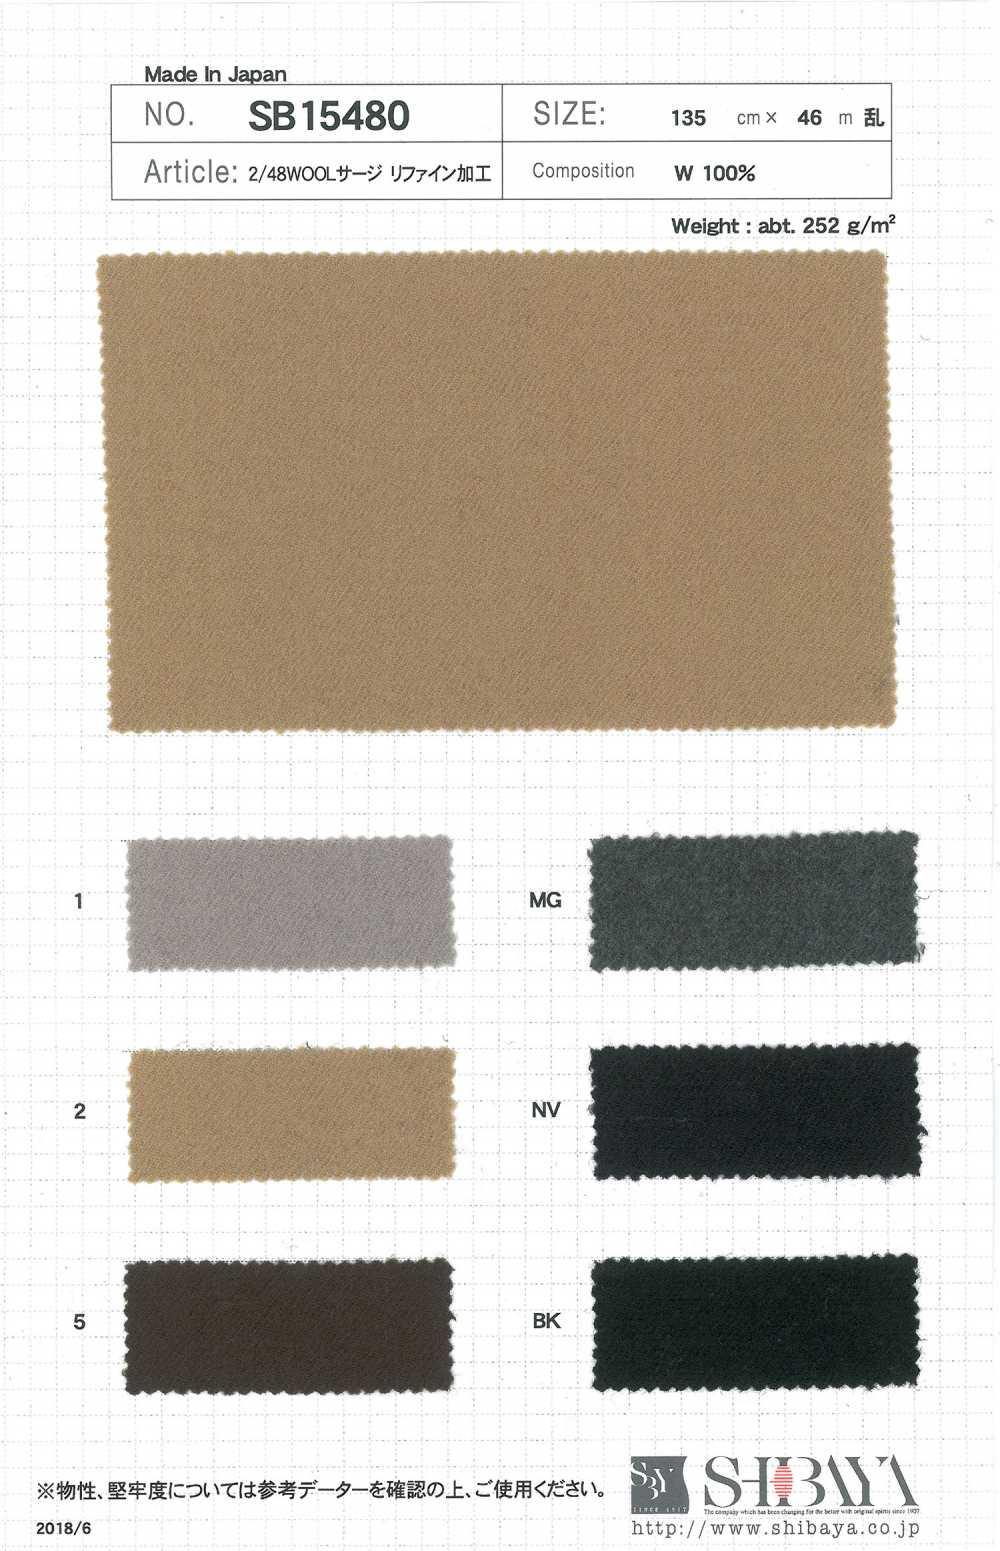 SB15480 2/48 WOOL サージ リファイン加工[生地] 柴屋/オークラ商事 - ApparelX アパレル資材卸通販